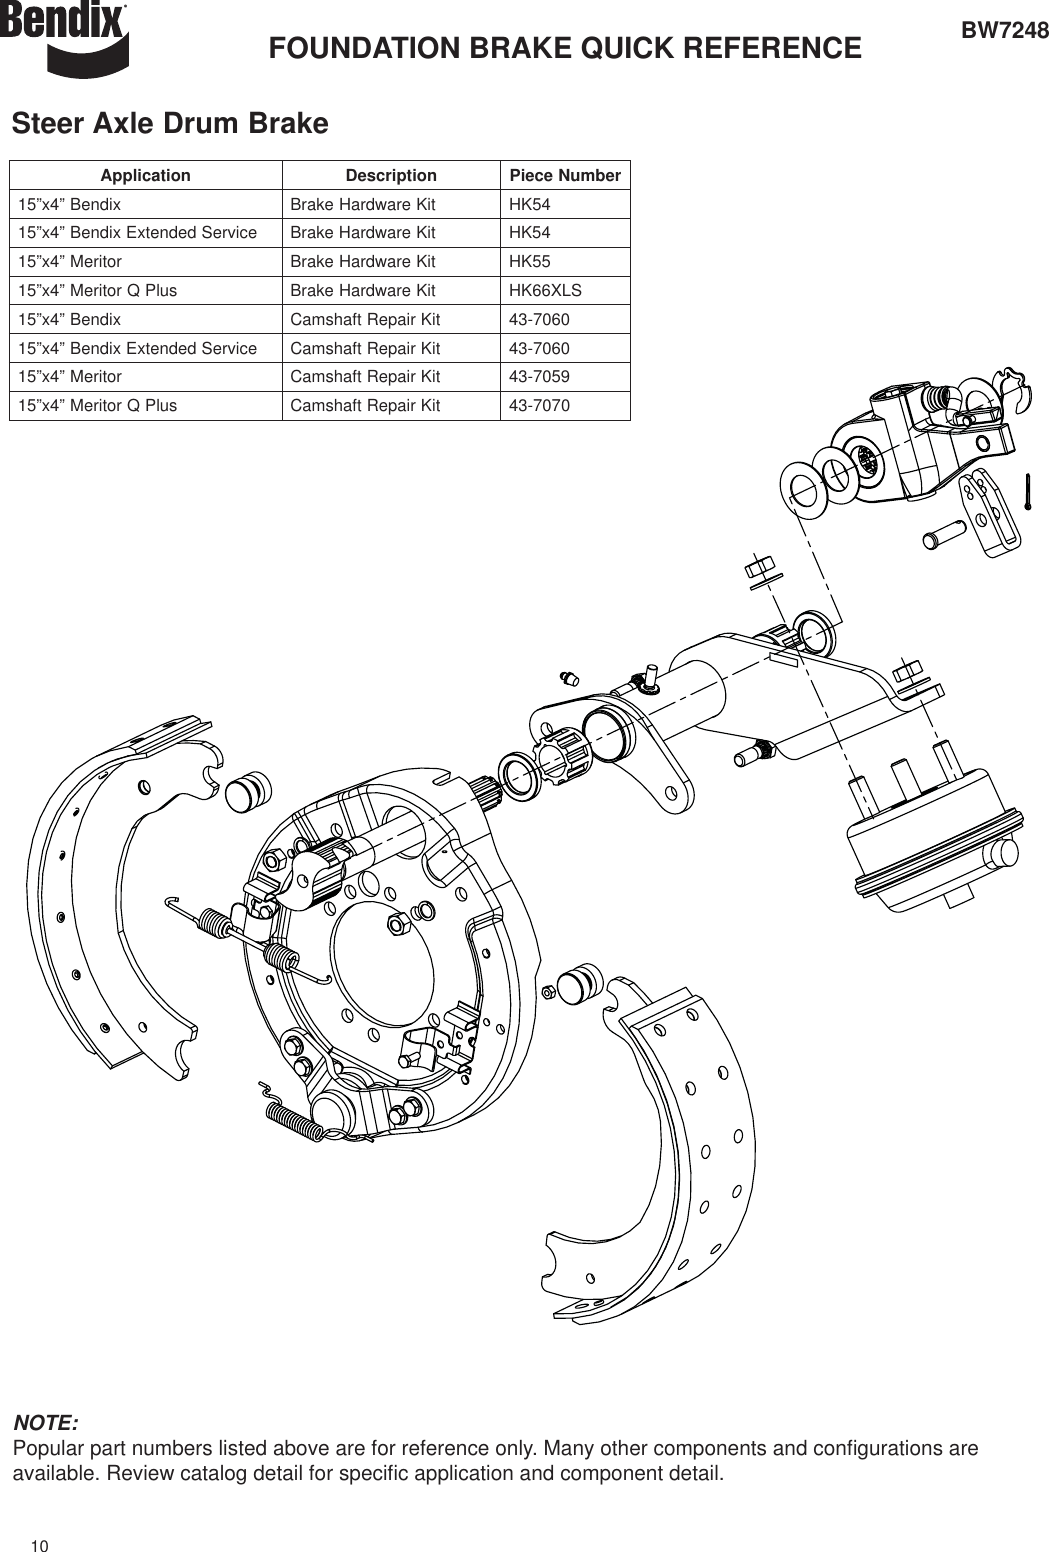 Bendix Bw7248 Users Manual